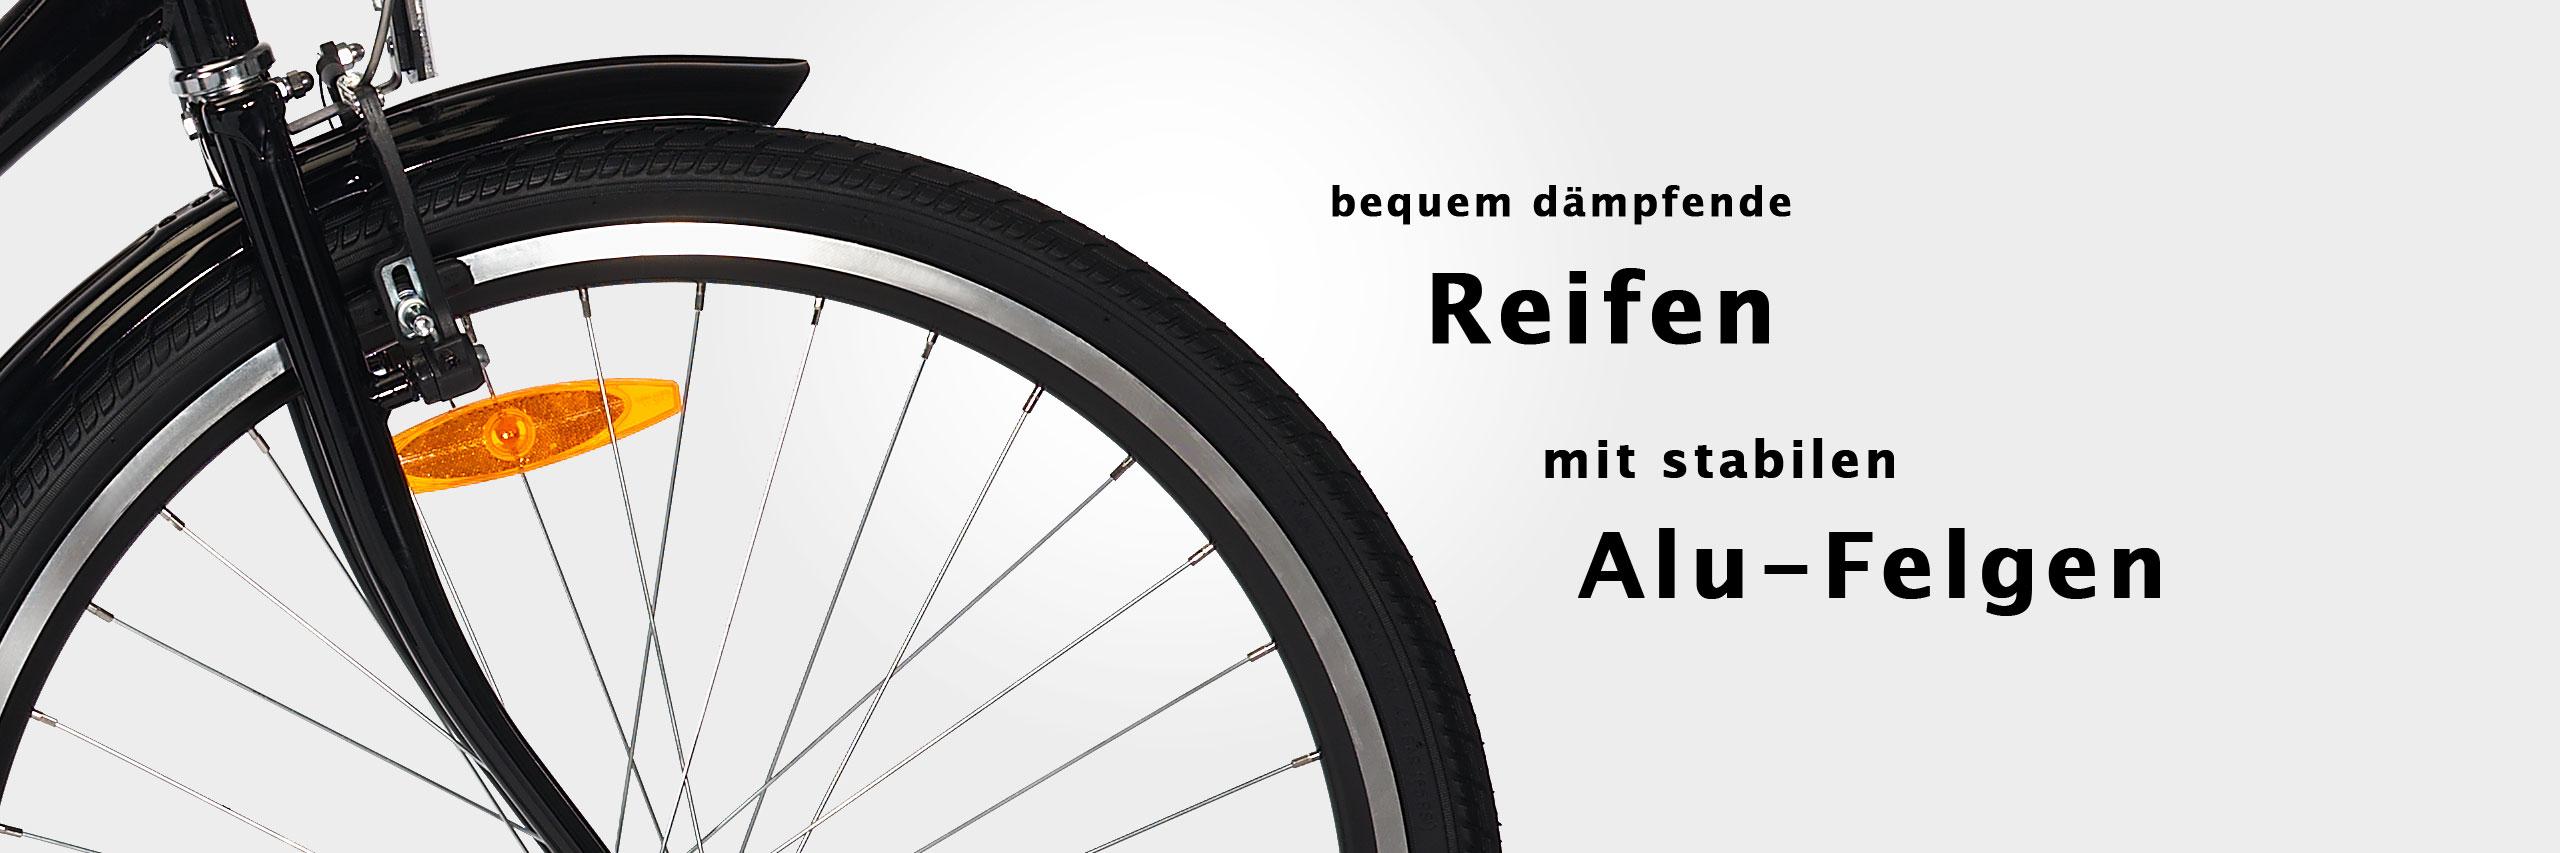 slide12-reifen